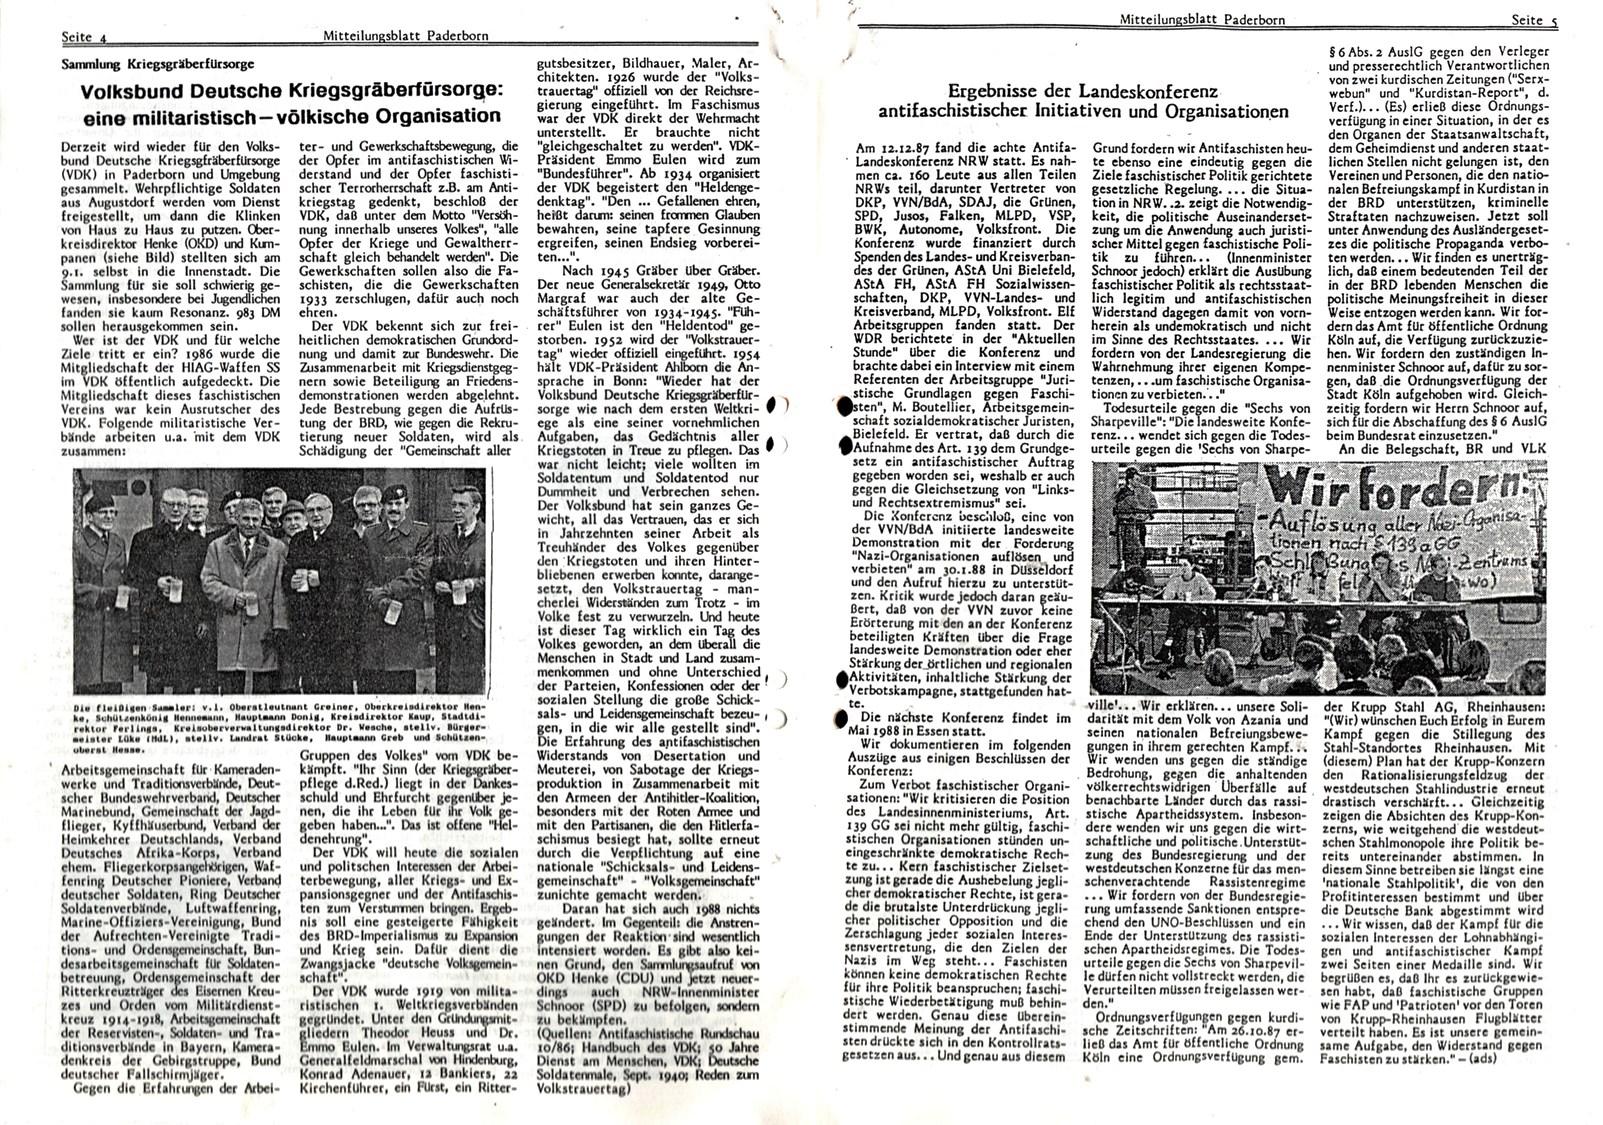 Paderborn_BWK_Mitteilungsblatt_19880124_003